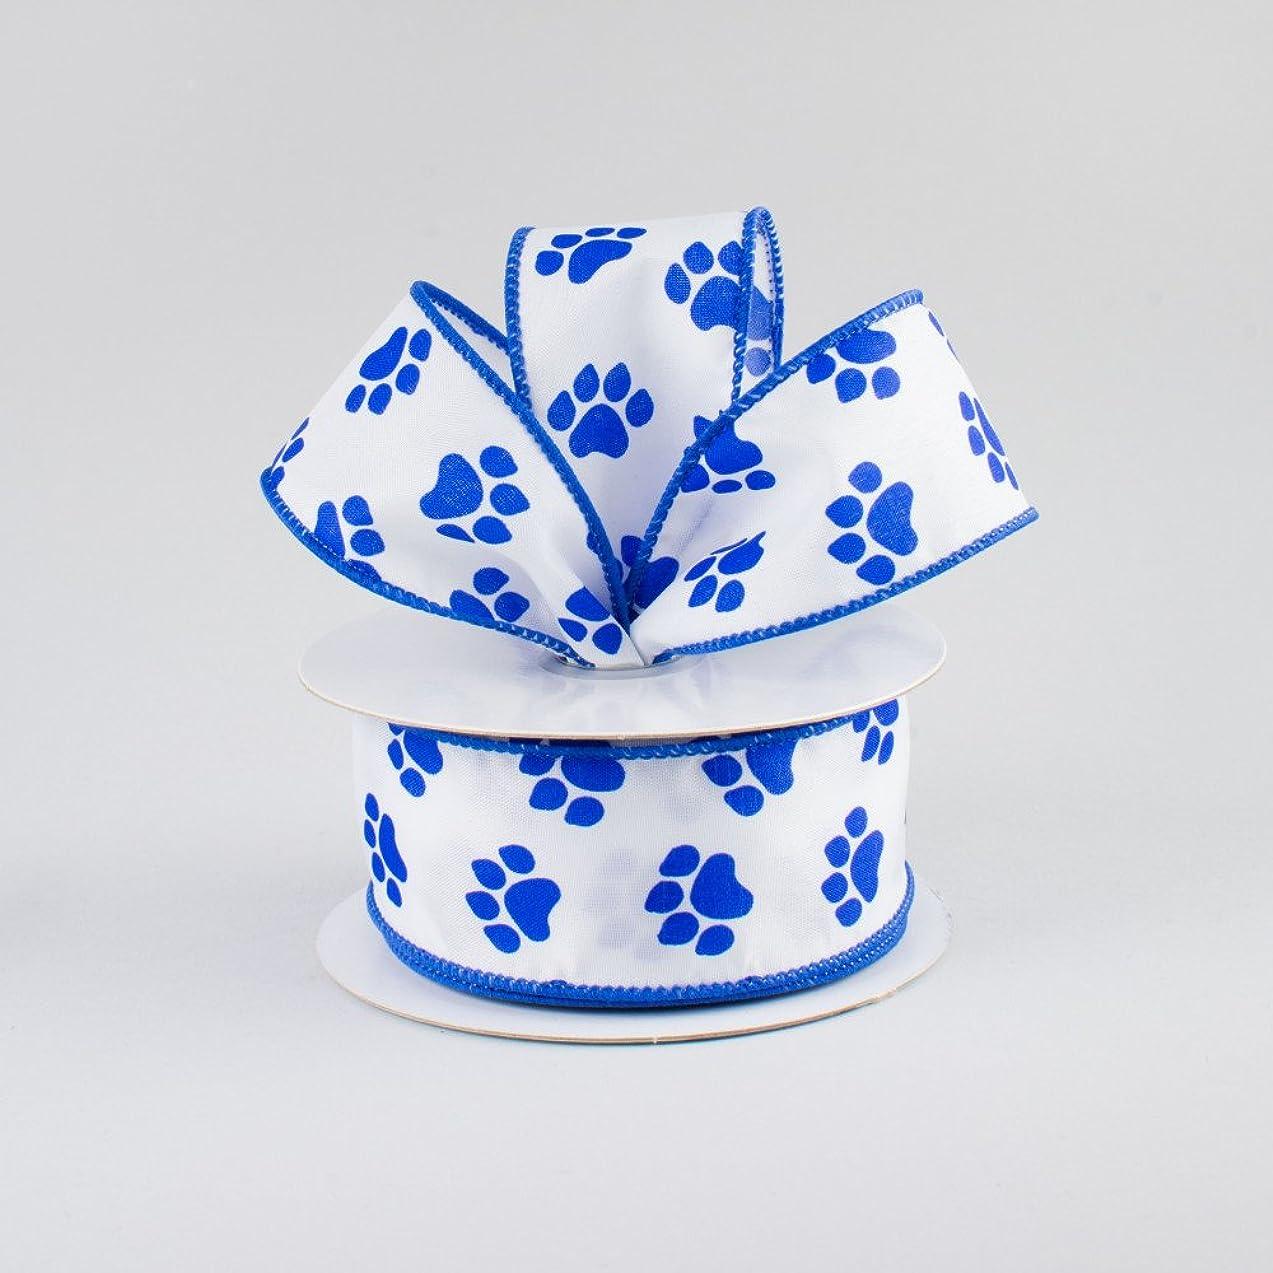 White Satin with Blue Paw Prints 1.5